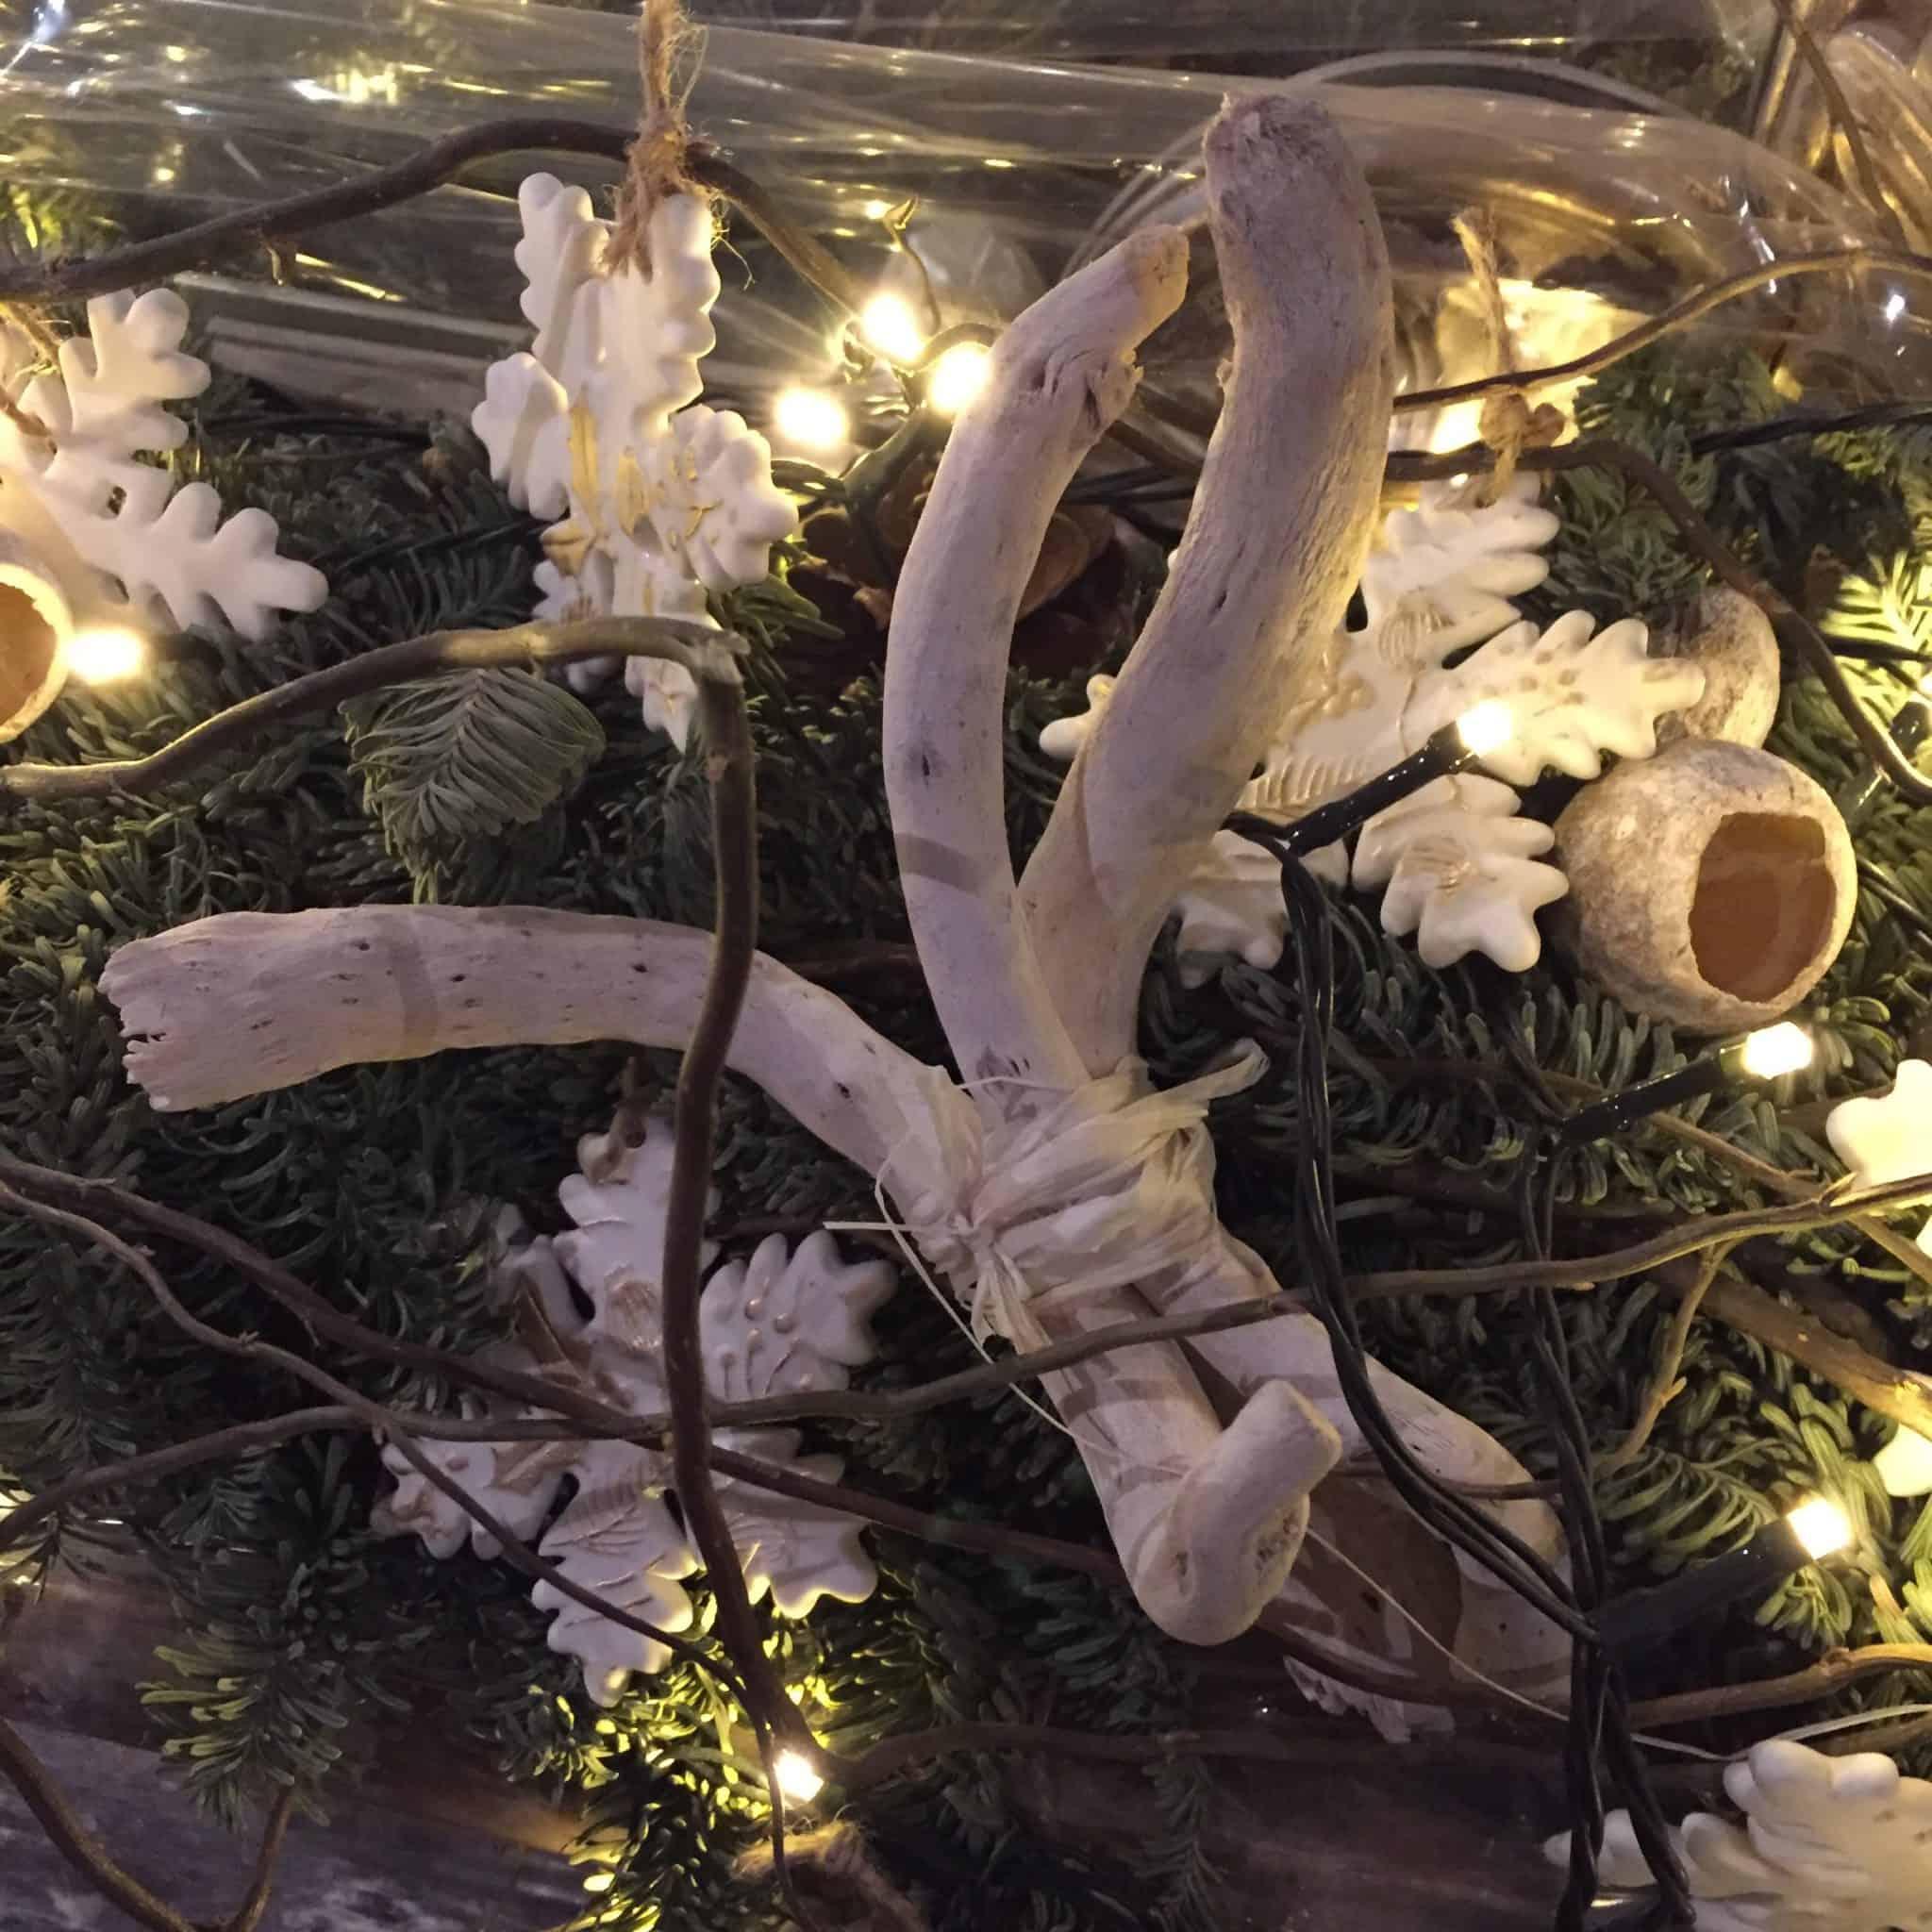 Waddesdon Manor Christmas decorations